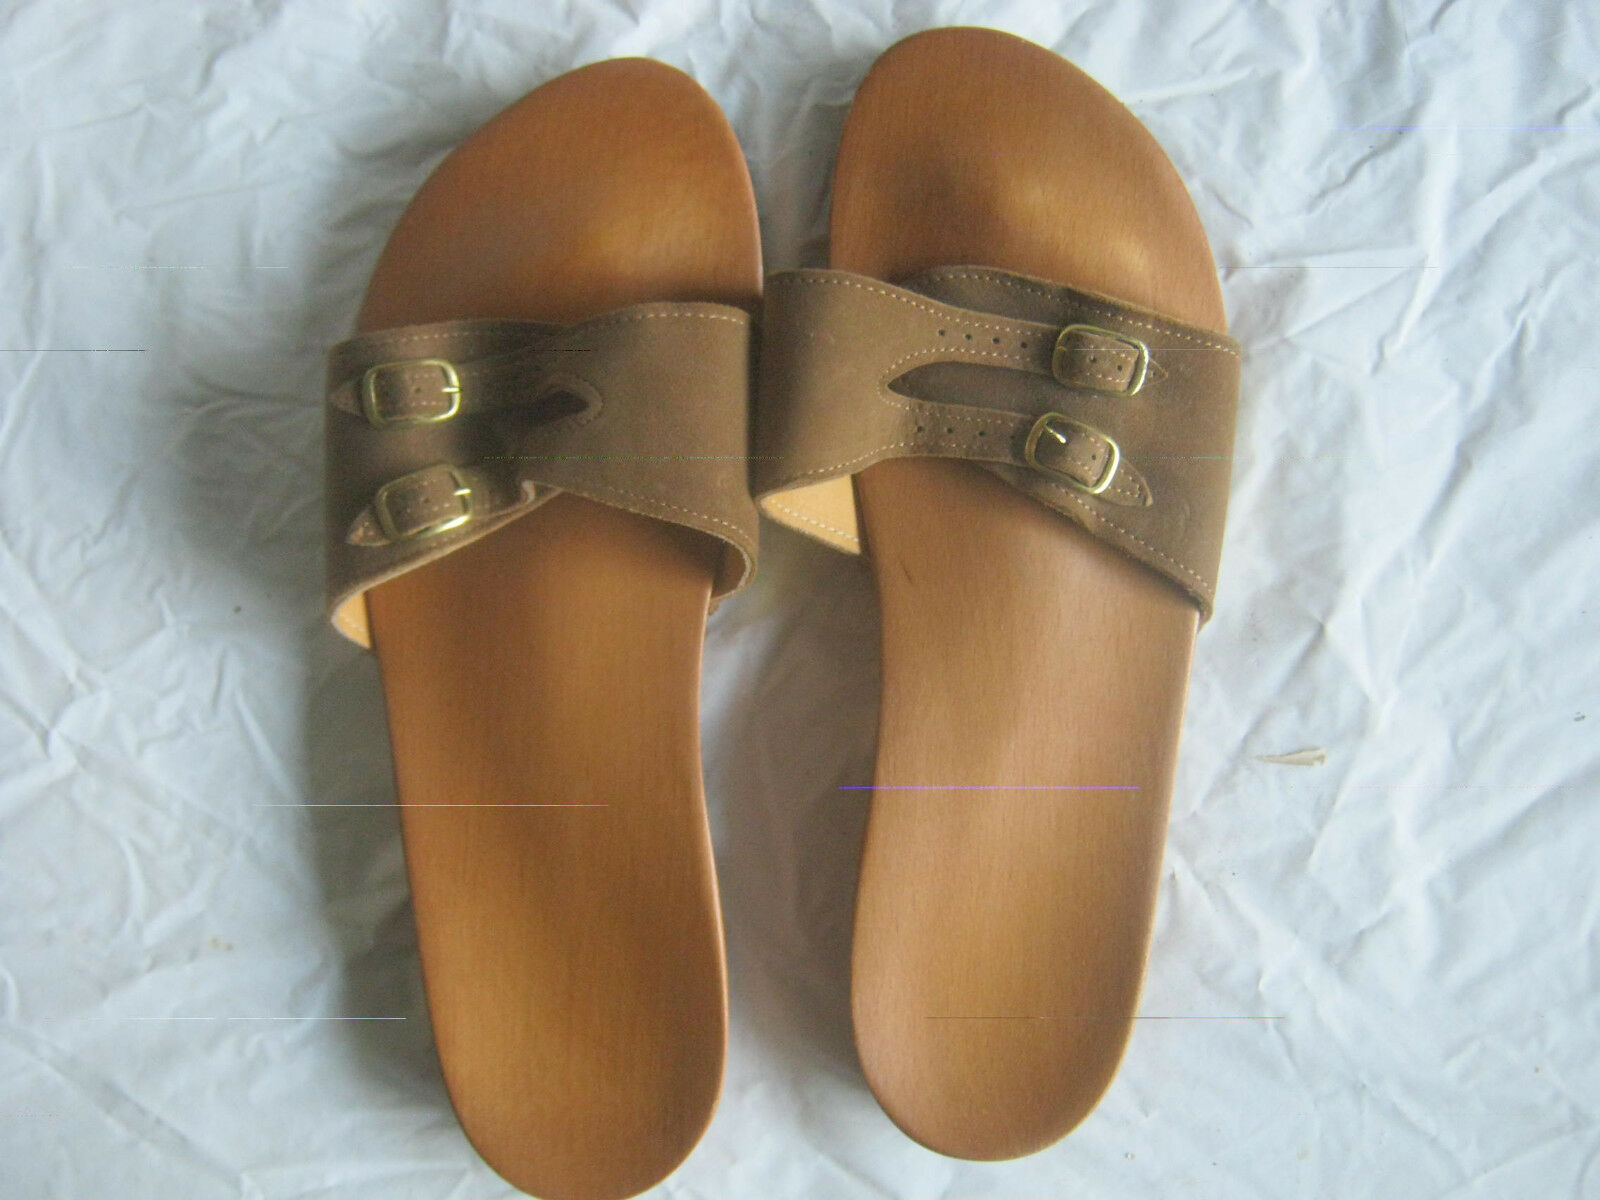 Vintage Dr Scholl's Foot Exercizer Sandal Size 7 Brown